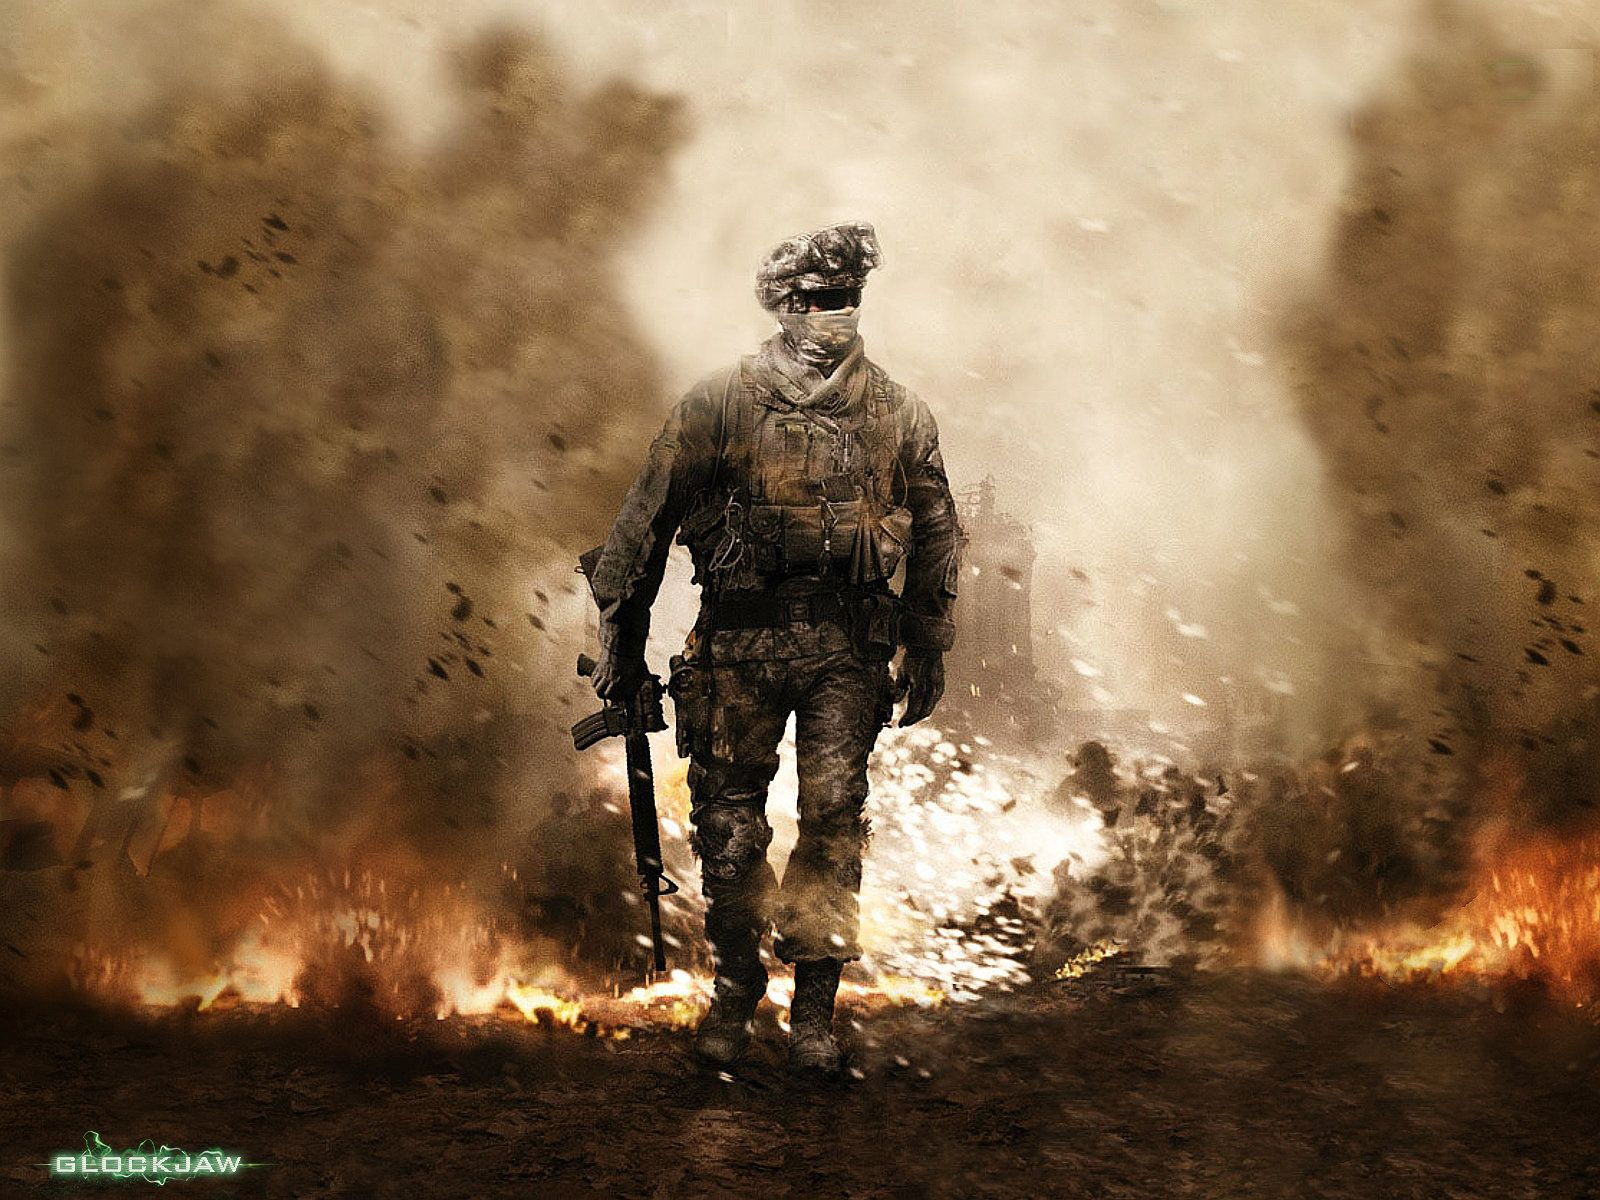 Modern Warfare 2 Wallpapers Top Free Modern Warfare 2